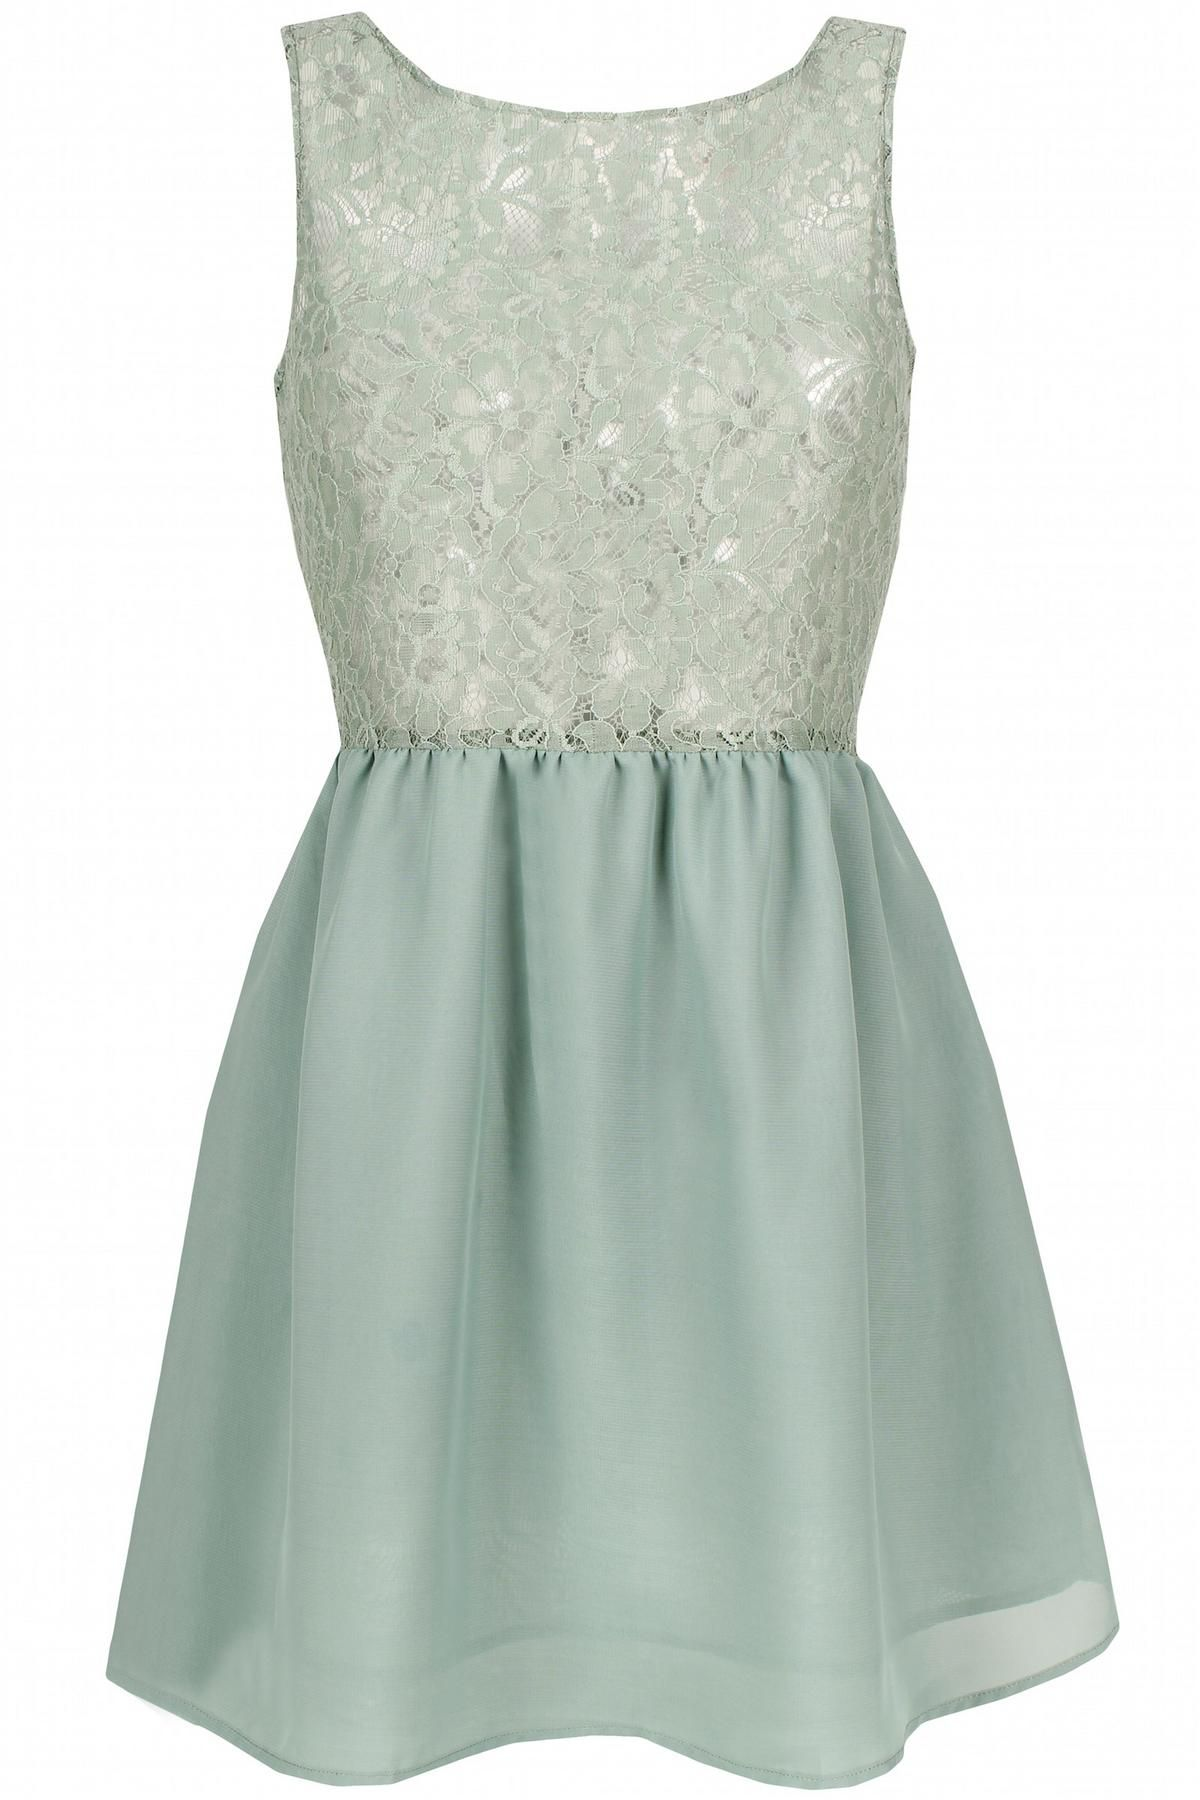 Light blue dress for wedding  Mint Dress  looks I like  Pinterest  Mint dress Lace dress and